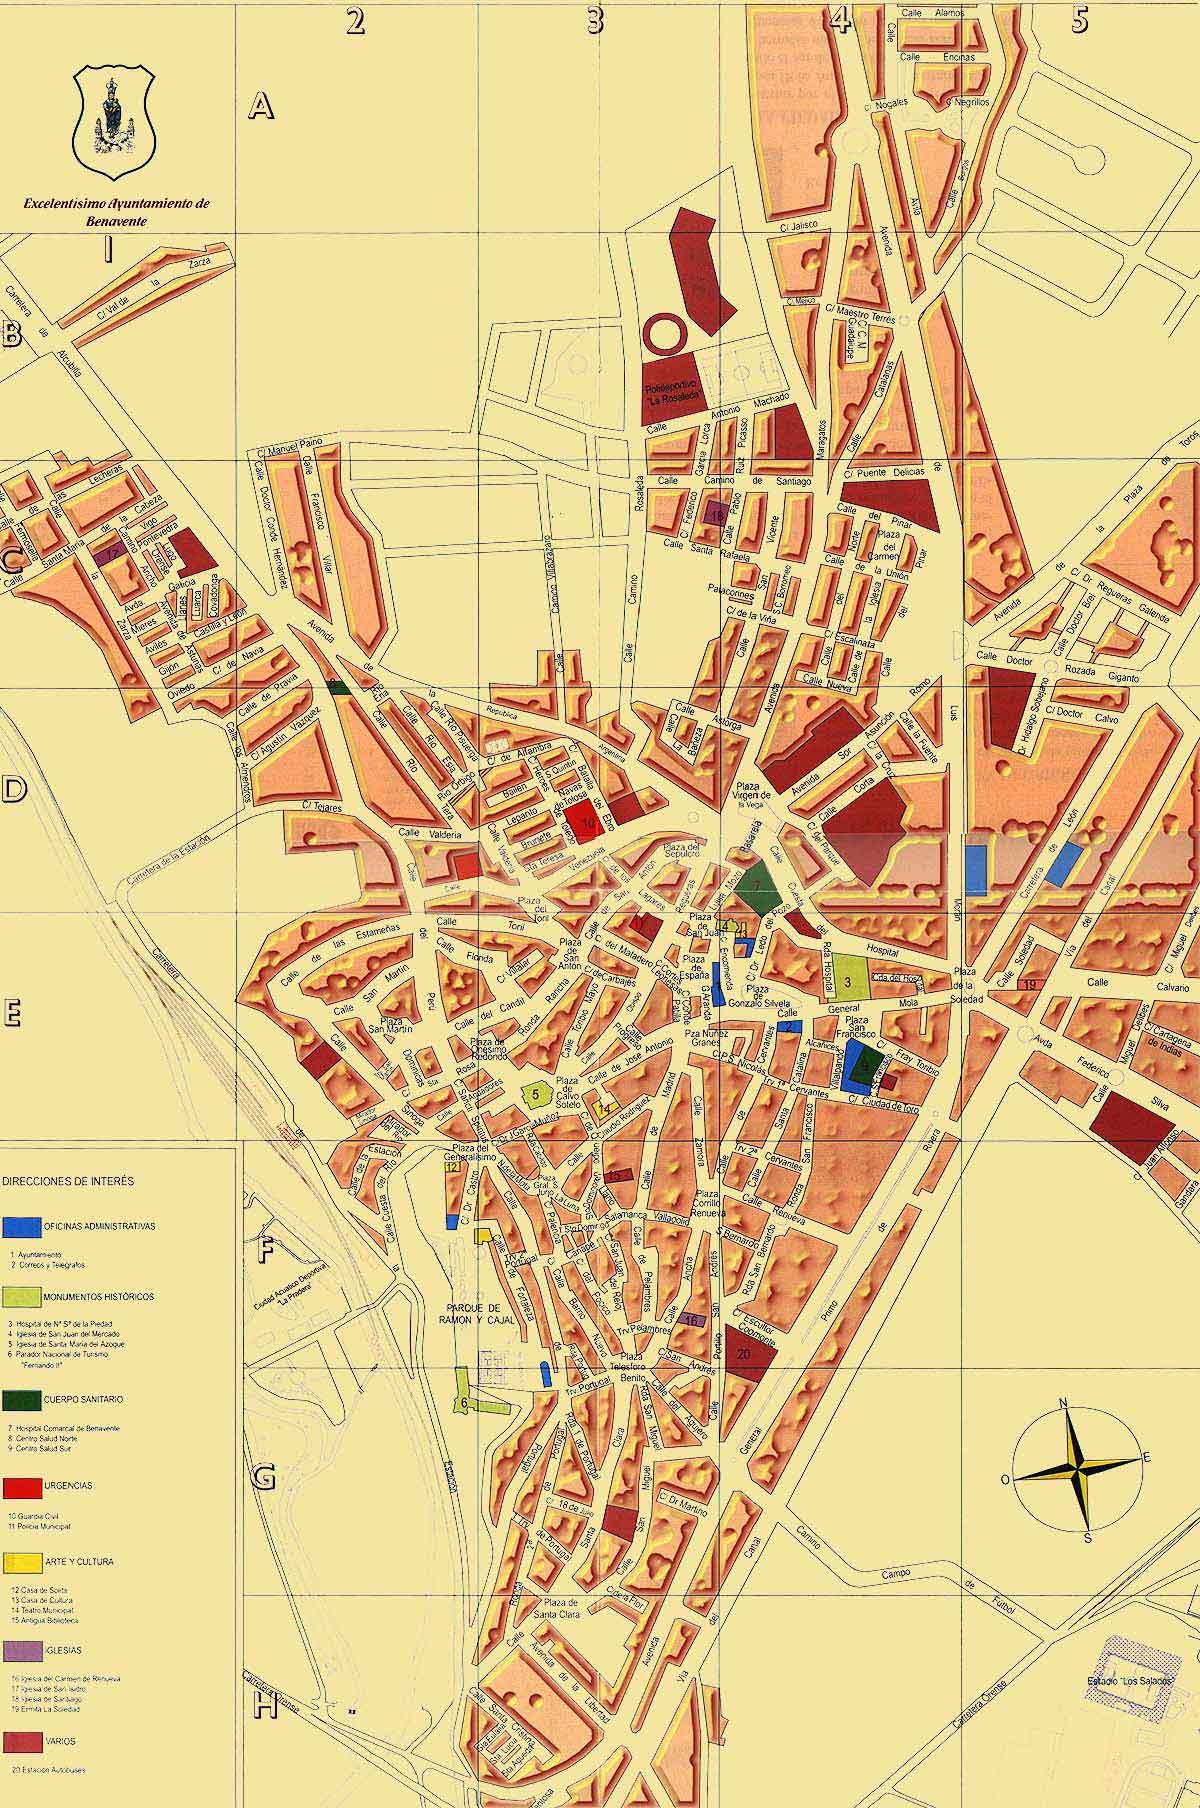 benavente mapa 49600 código postal de Benavente benavente mapa